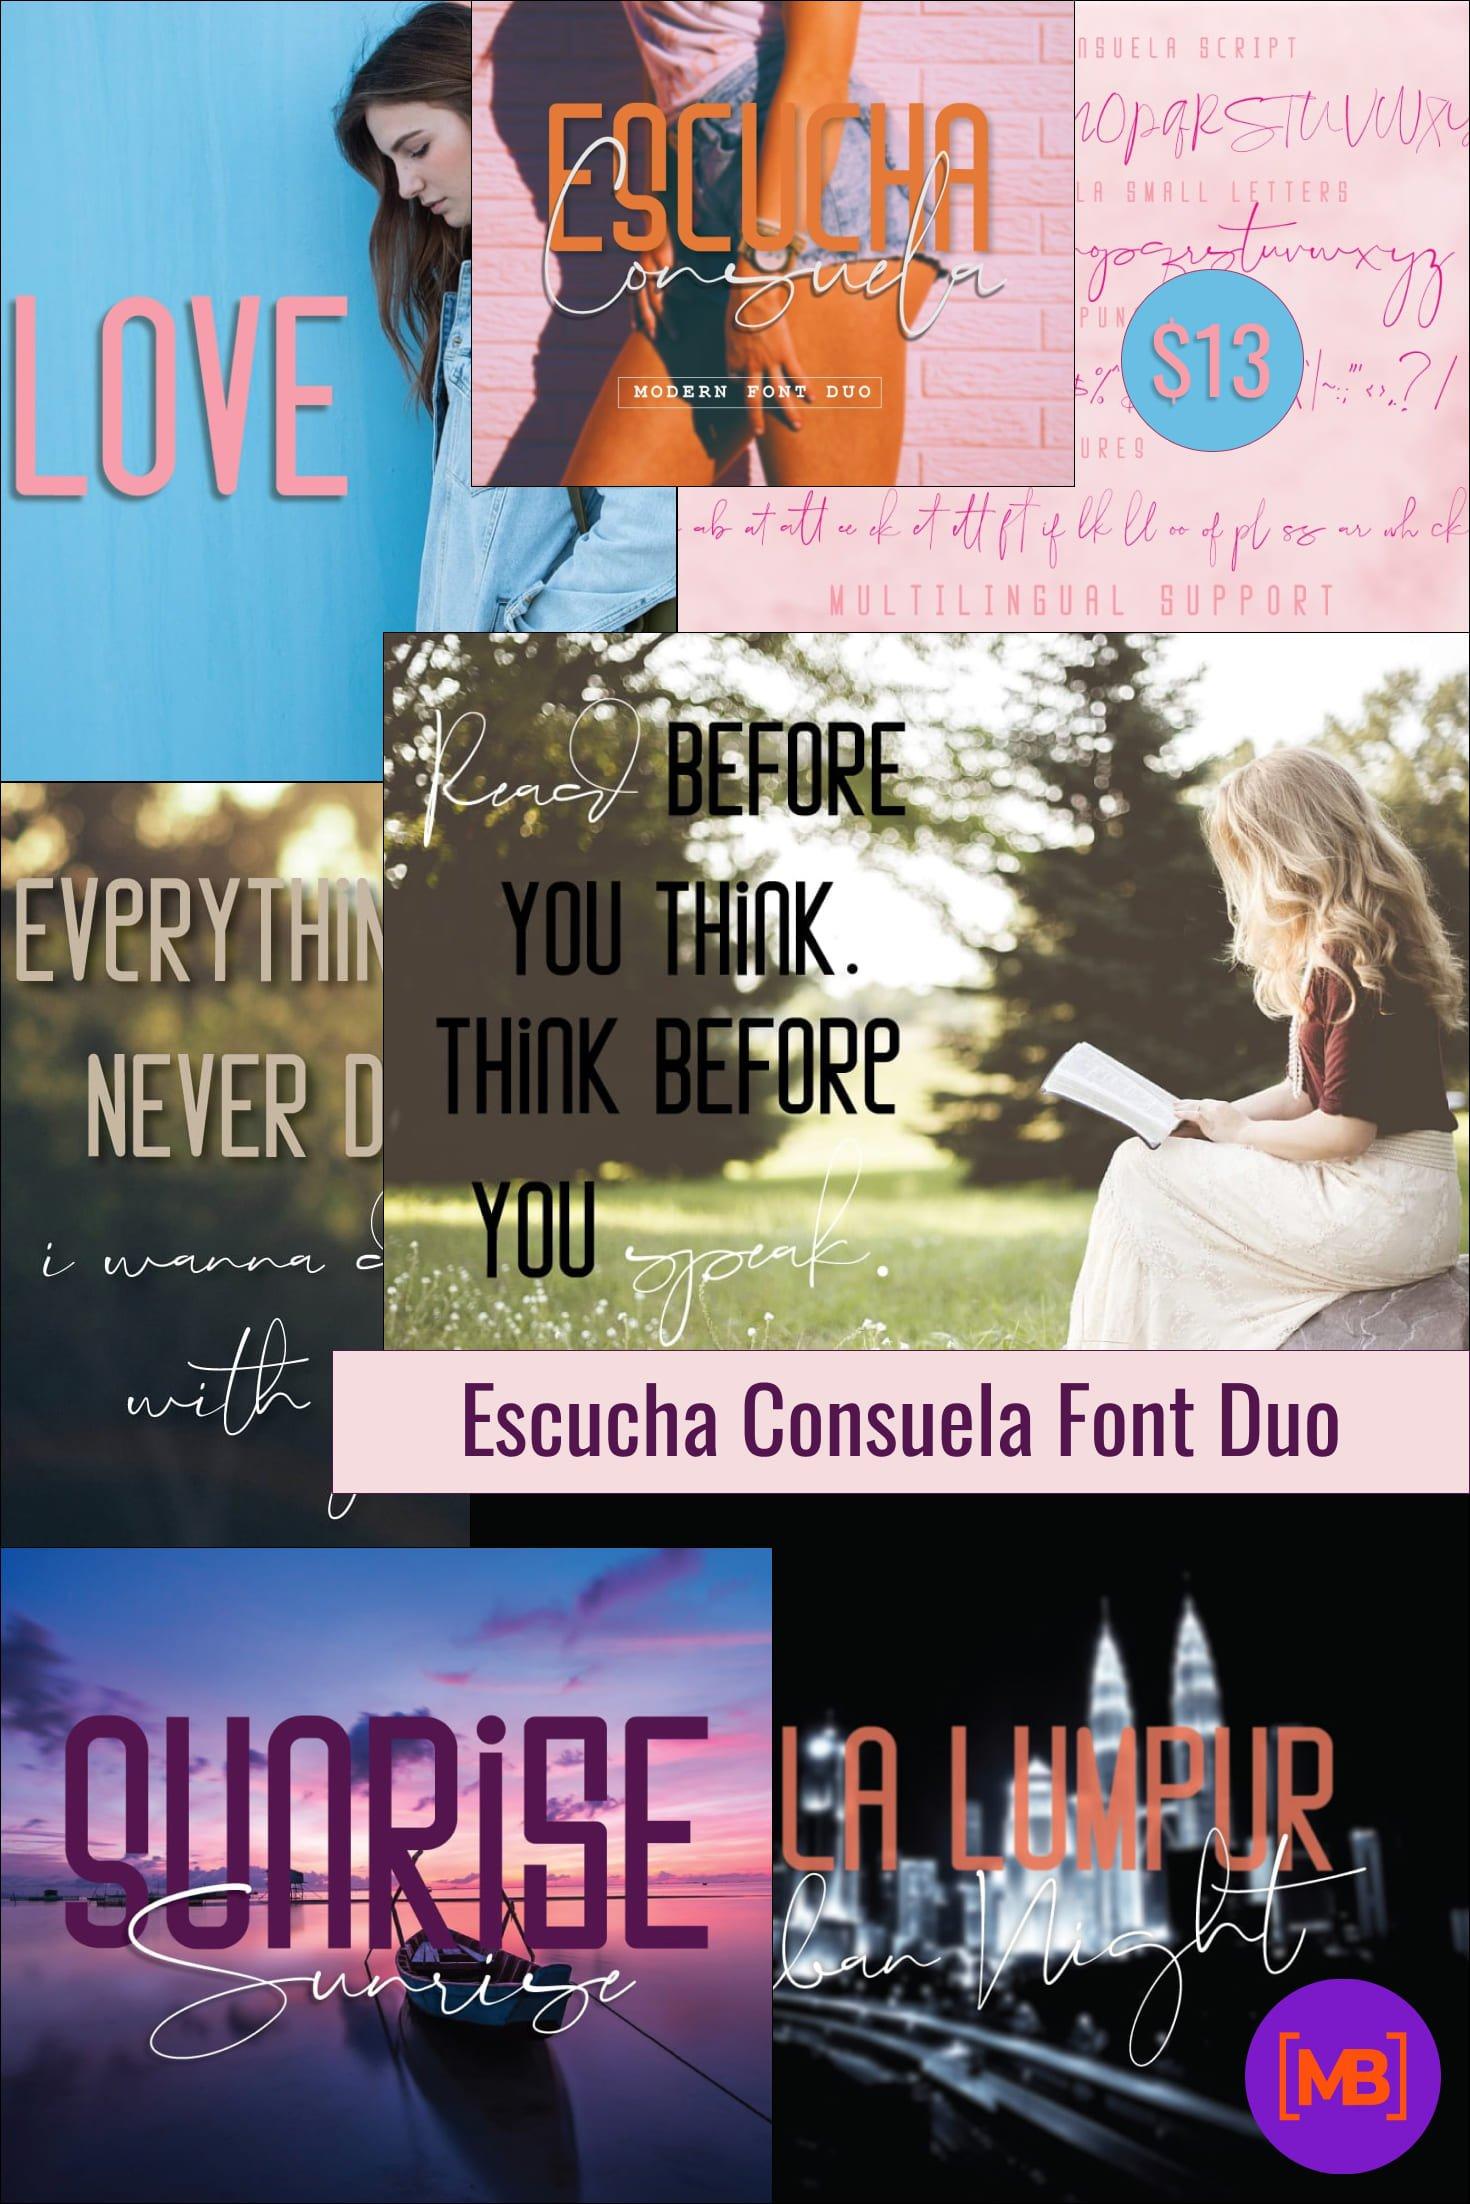 Escucha Consuela Font Duo - $13. Collage Image.